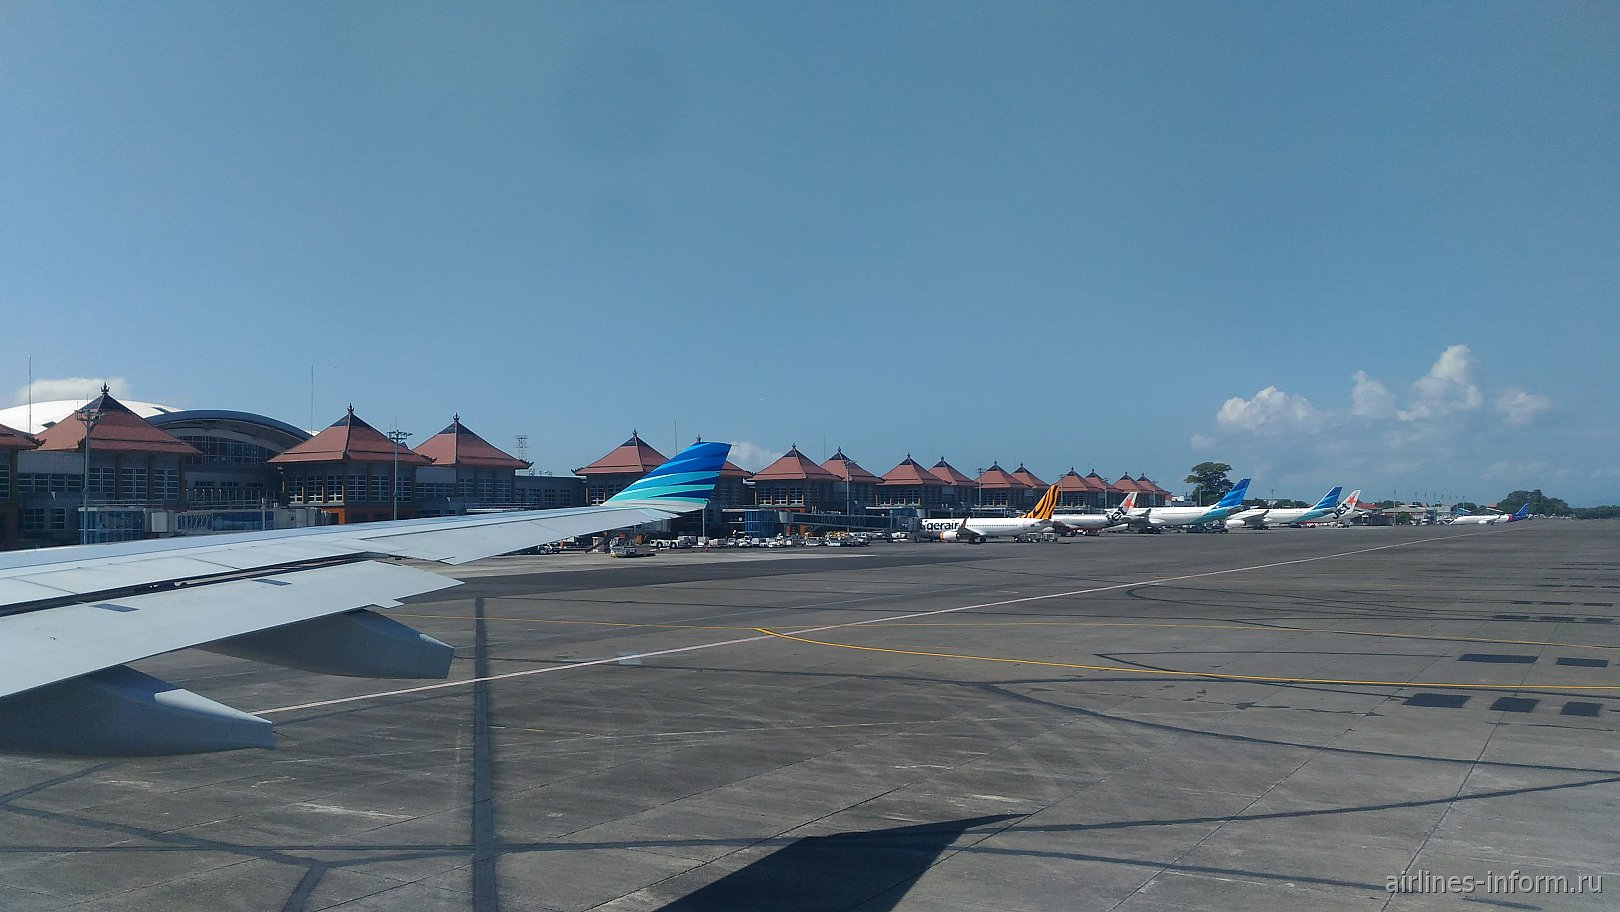 Международный терминал аэропорта Денпасар Нгура Рай